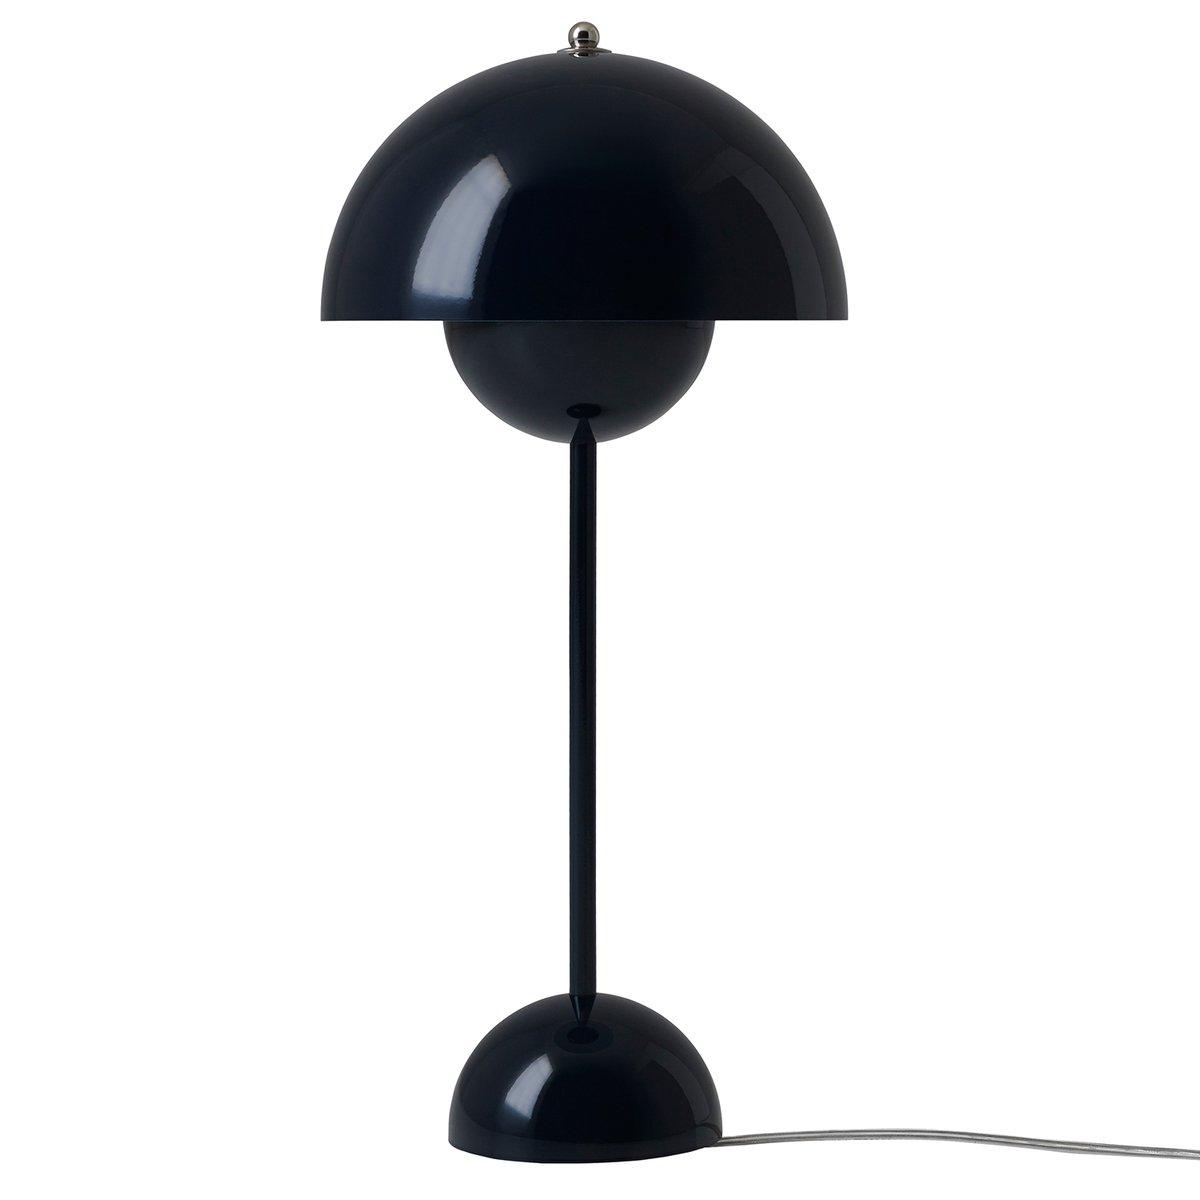 Tradition flowerpot vp3 table lamp black blue finnish design shop